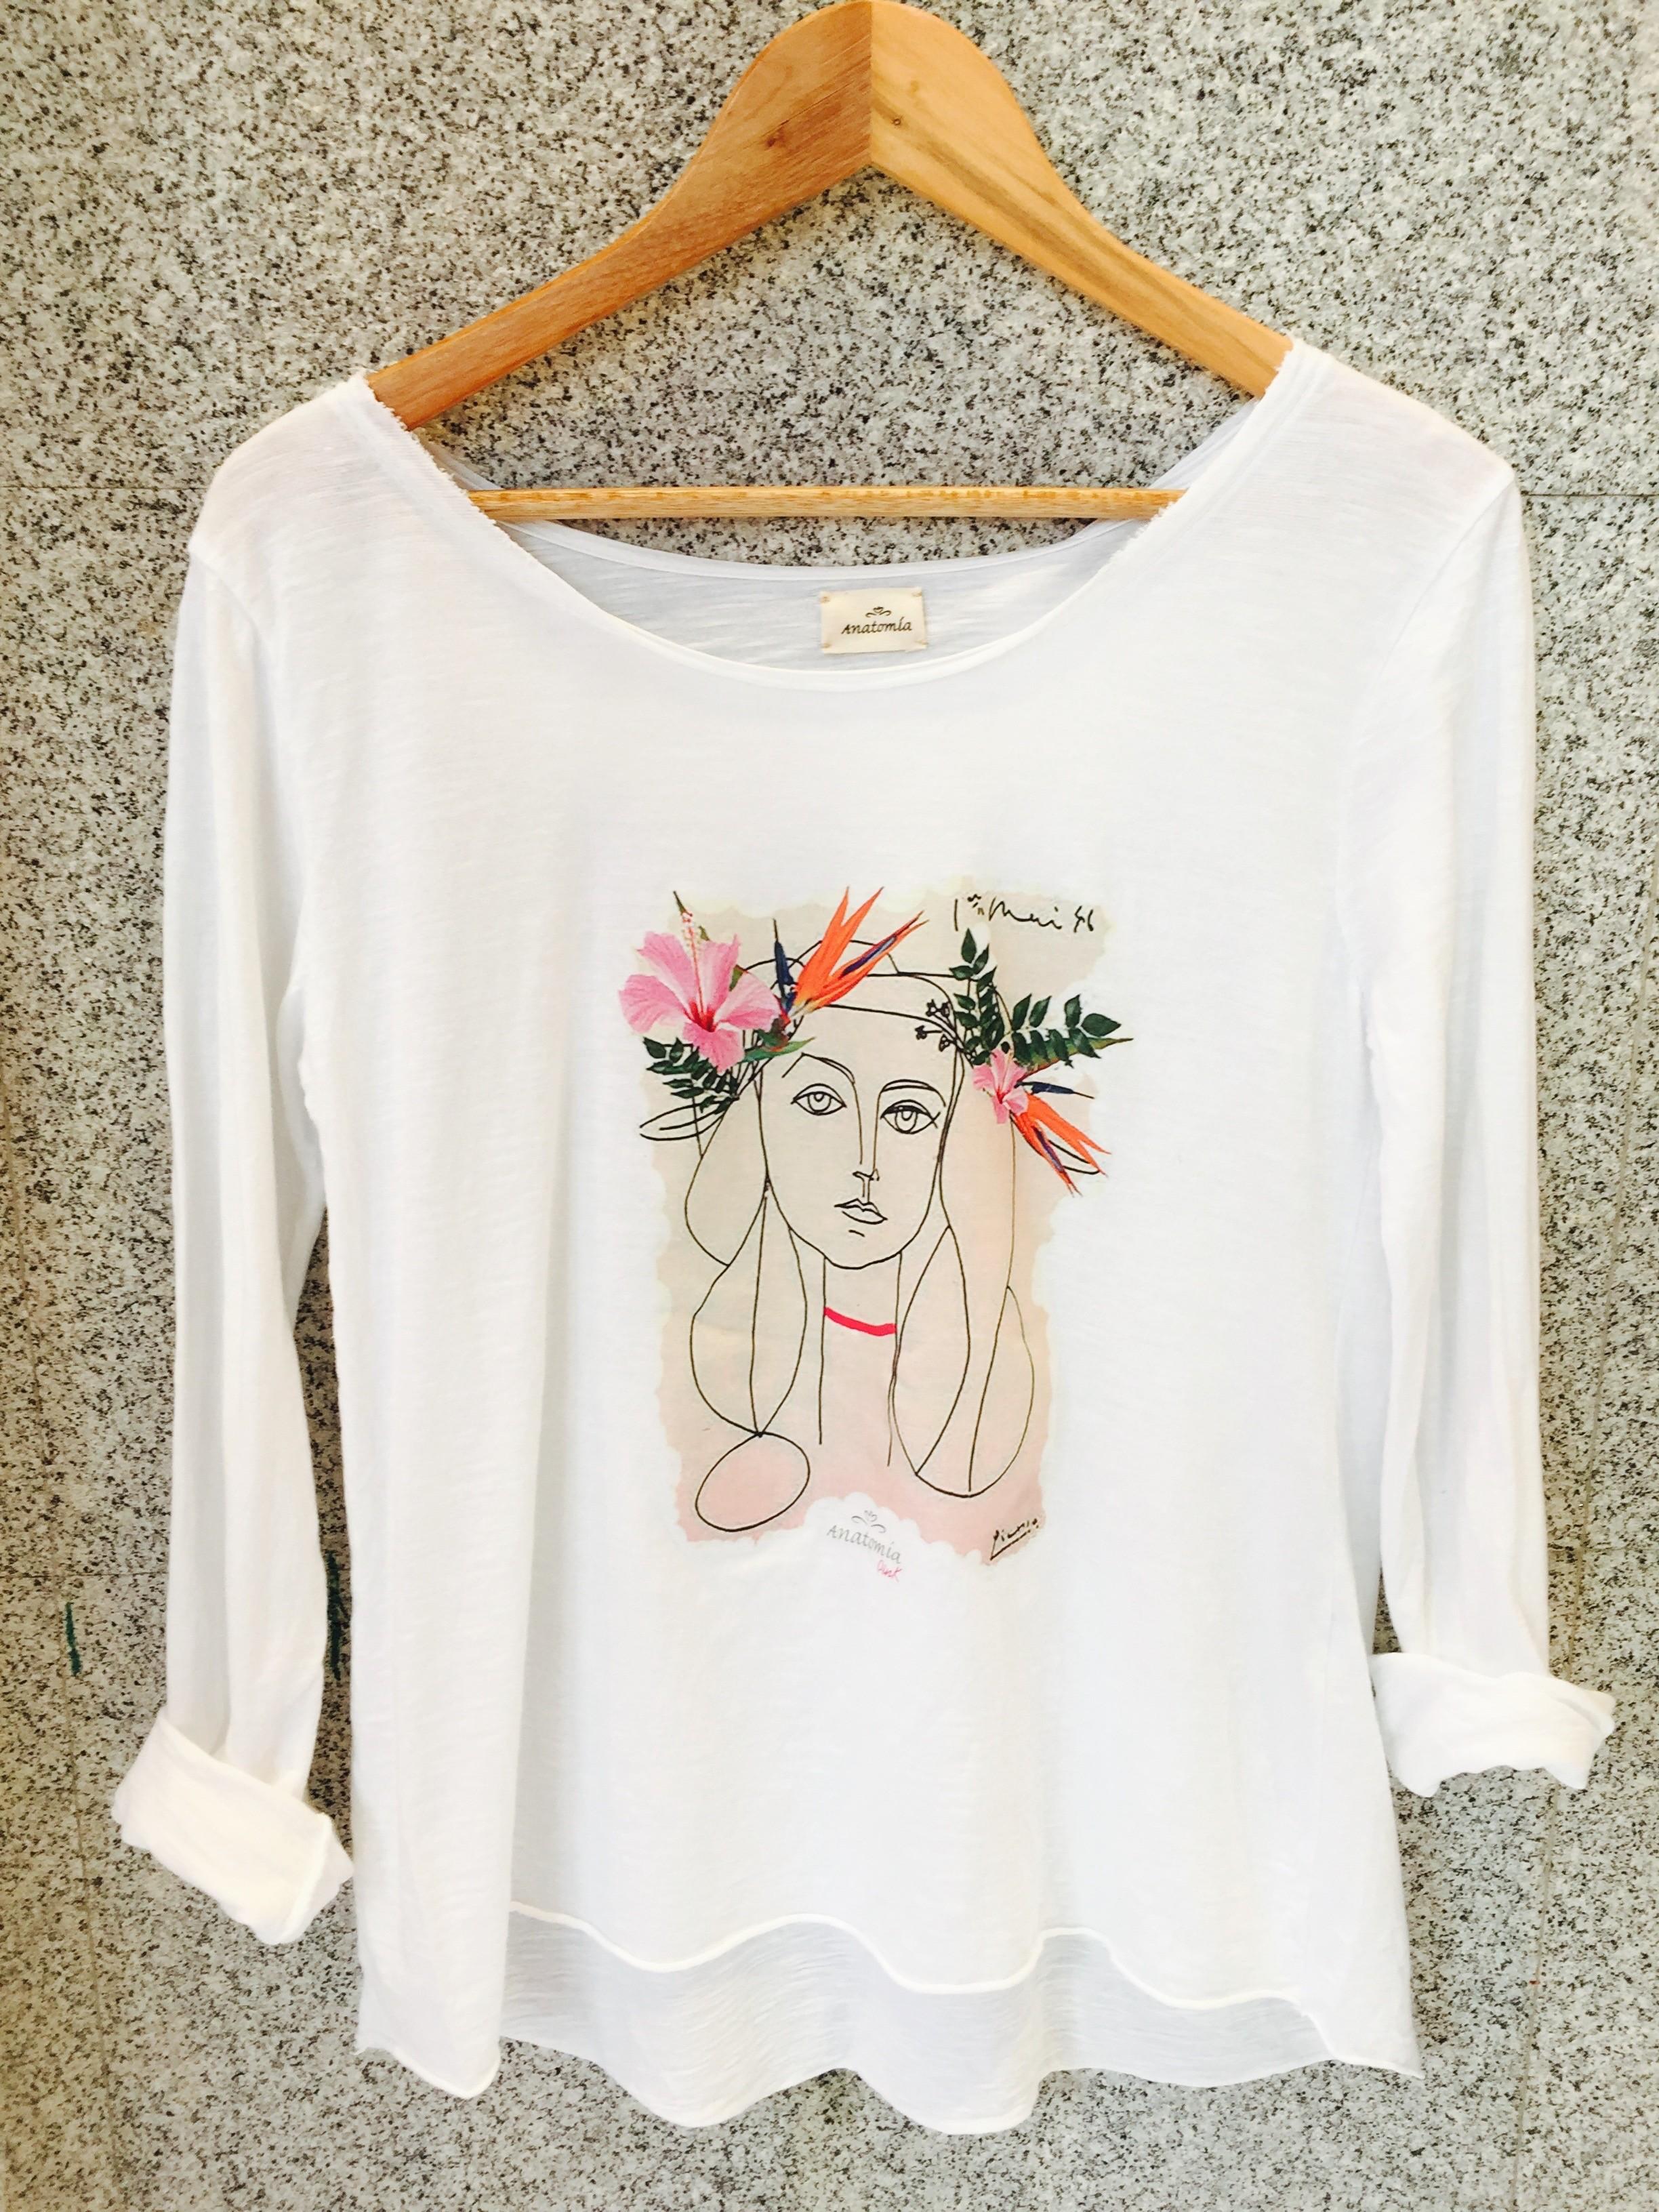 camiseta estampada blanca de algodón mujer de picasso arty arte